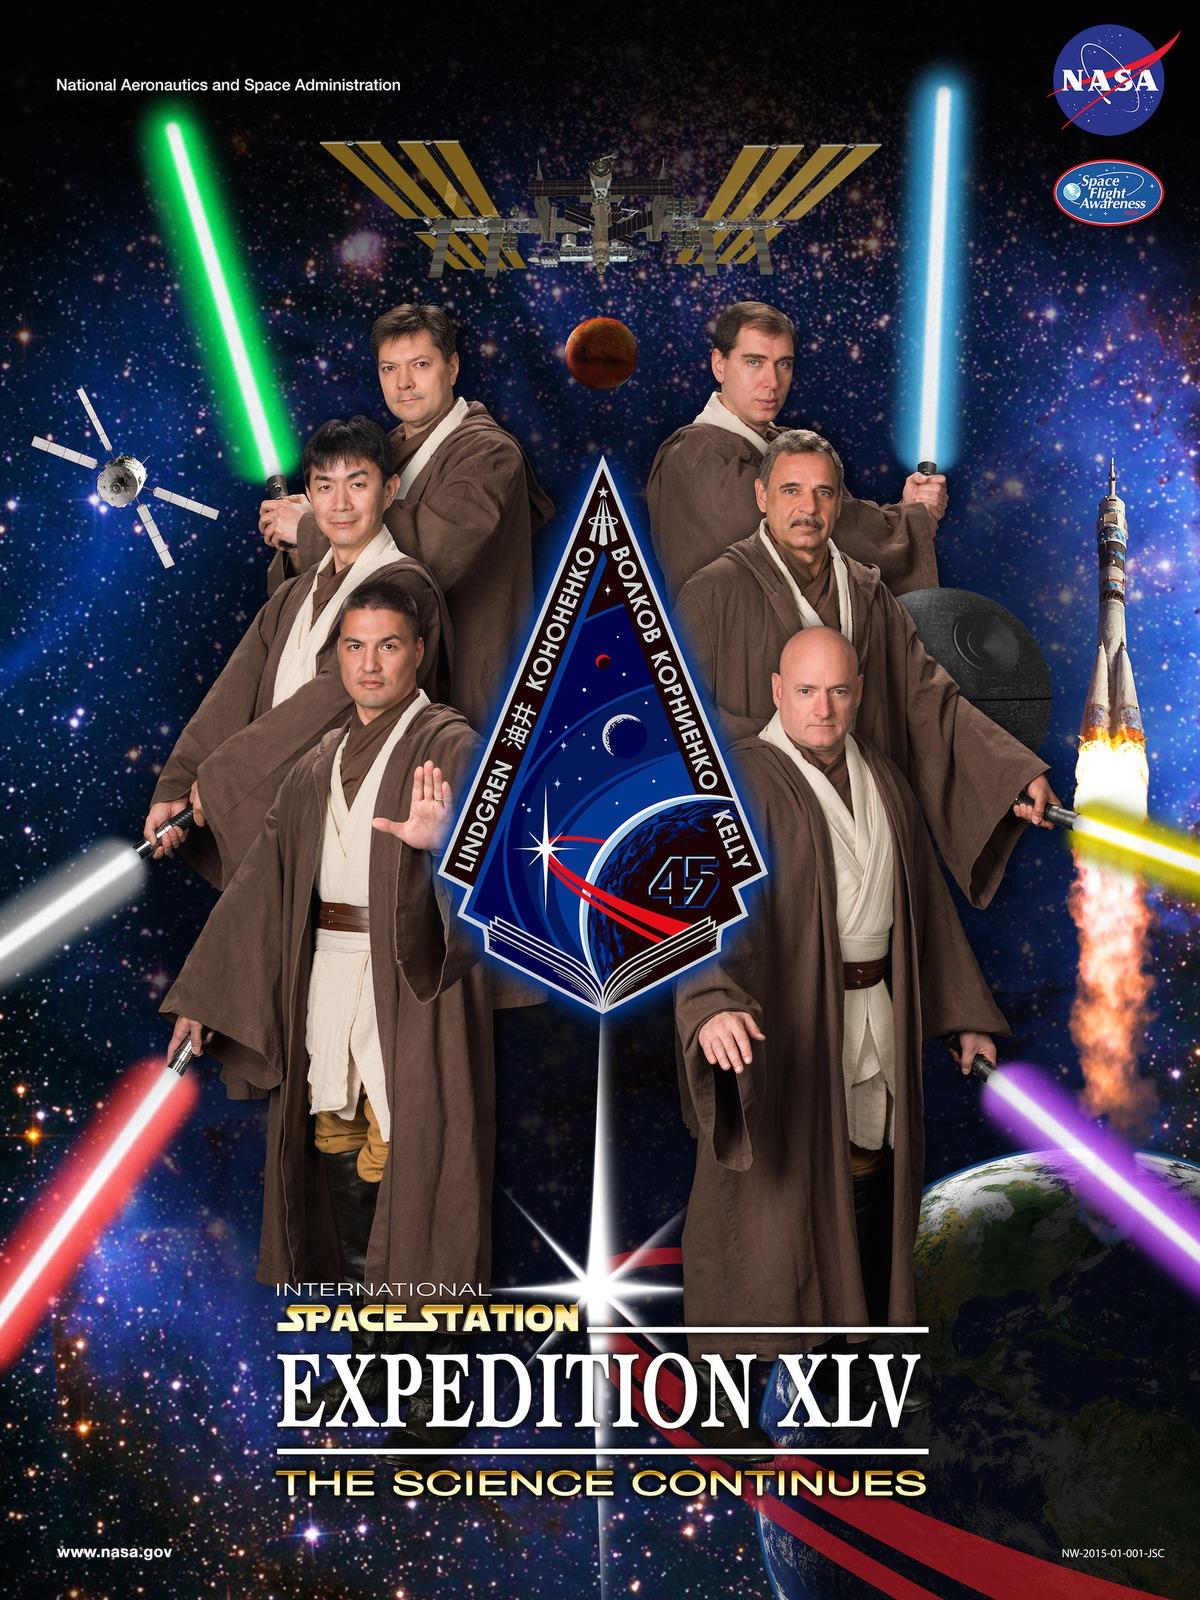 [FUN] Tout et (surtout) n'importe quoi sur Star Wars! - Page 3 Nasa-starwars